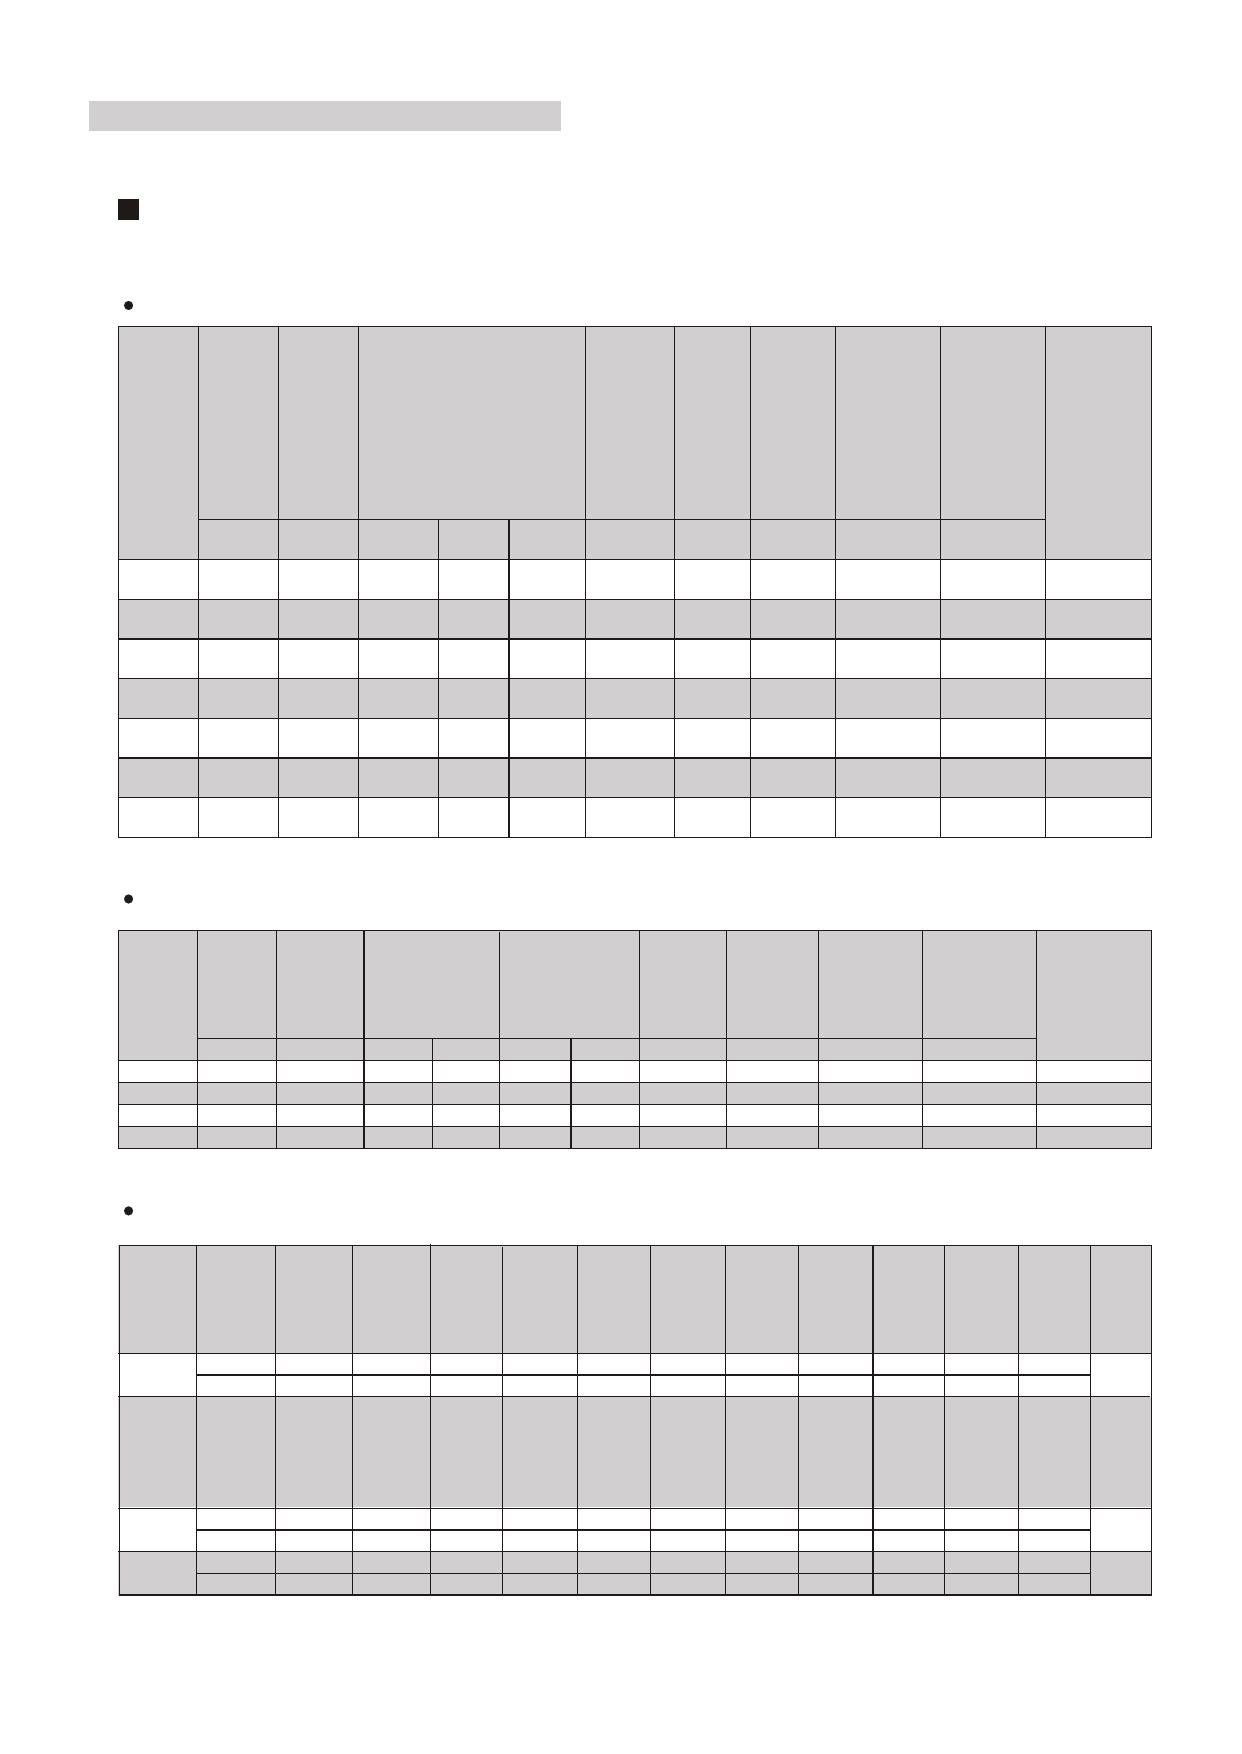 LBN4503 datasheet